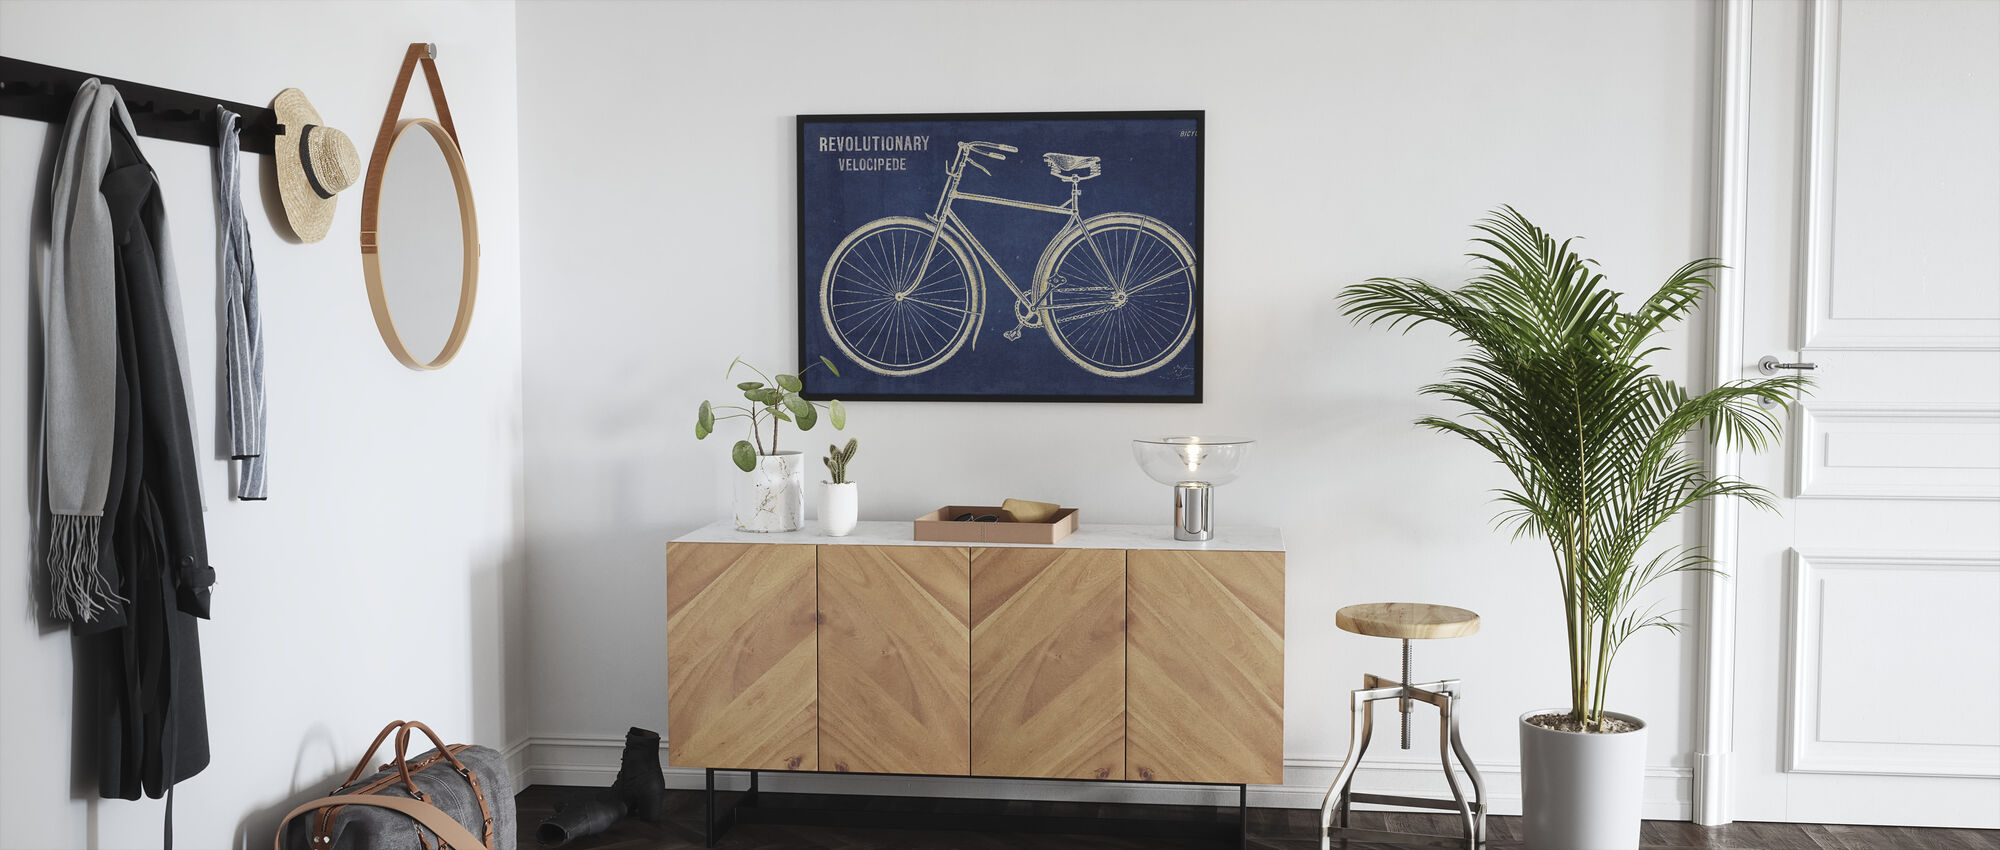 Planritning Cykel - Inramad tavla - Hall